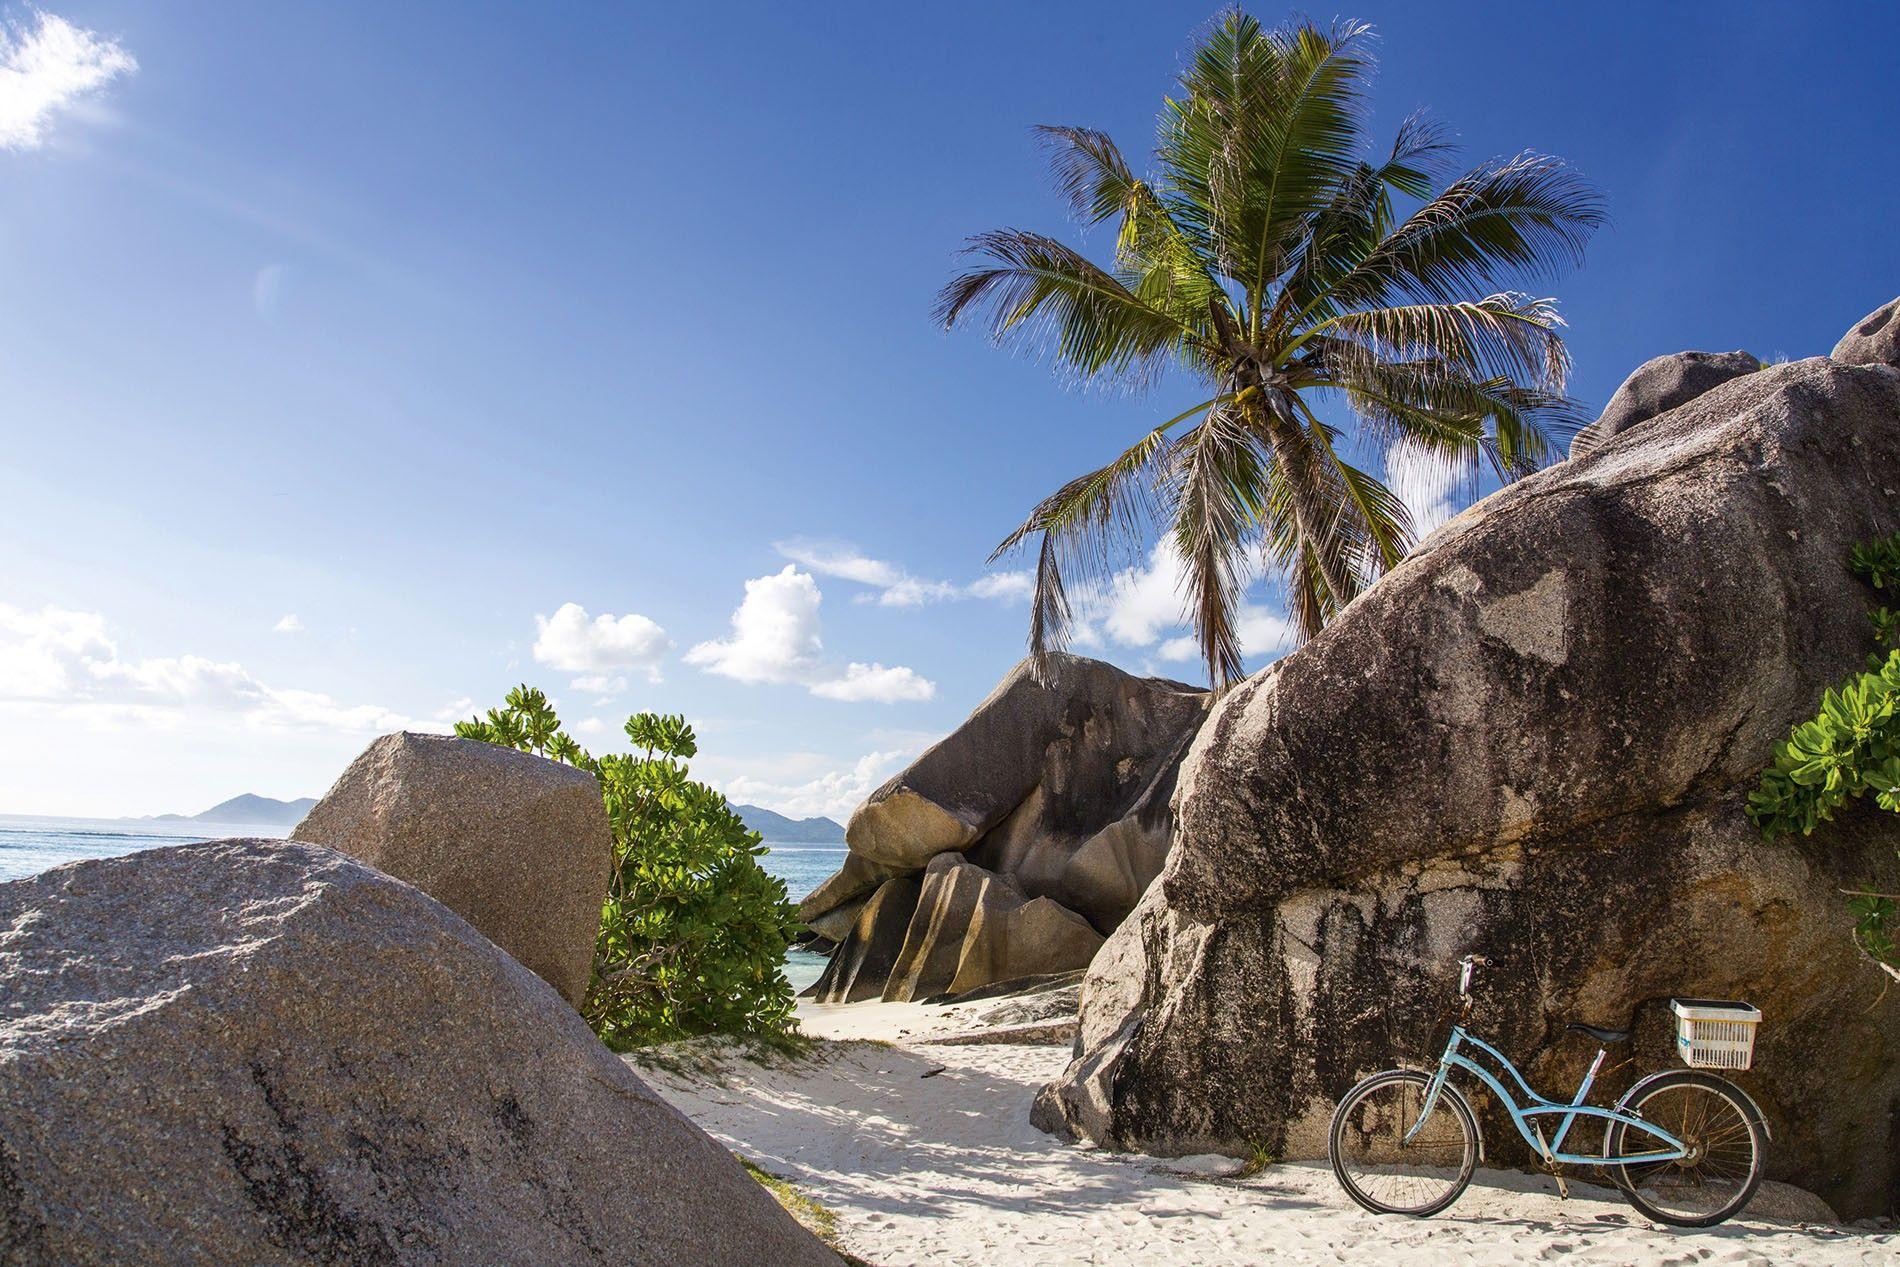 Anse Source d'Argent beach on Seychelles island of La Digue